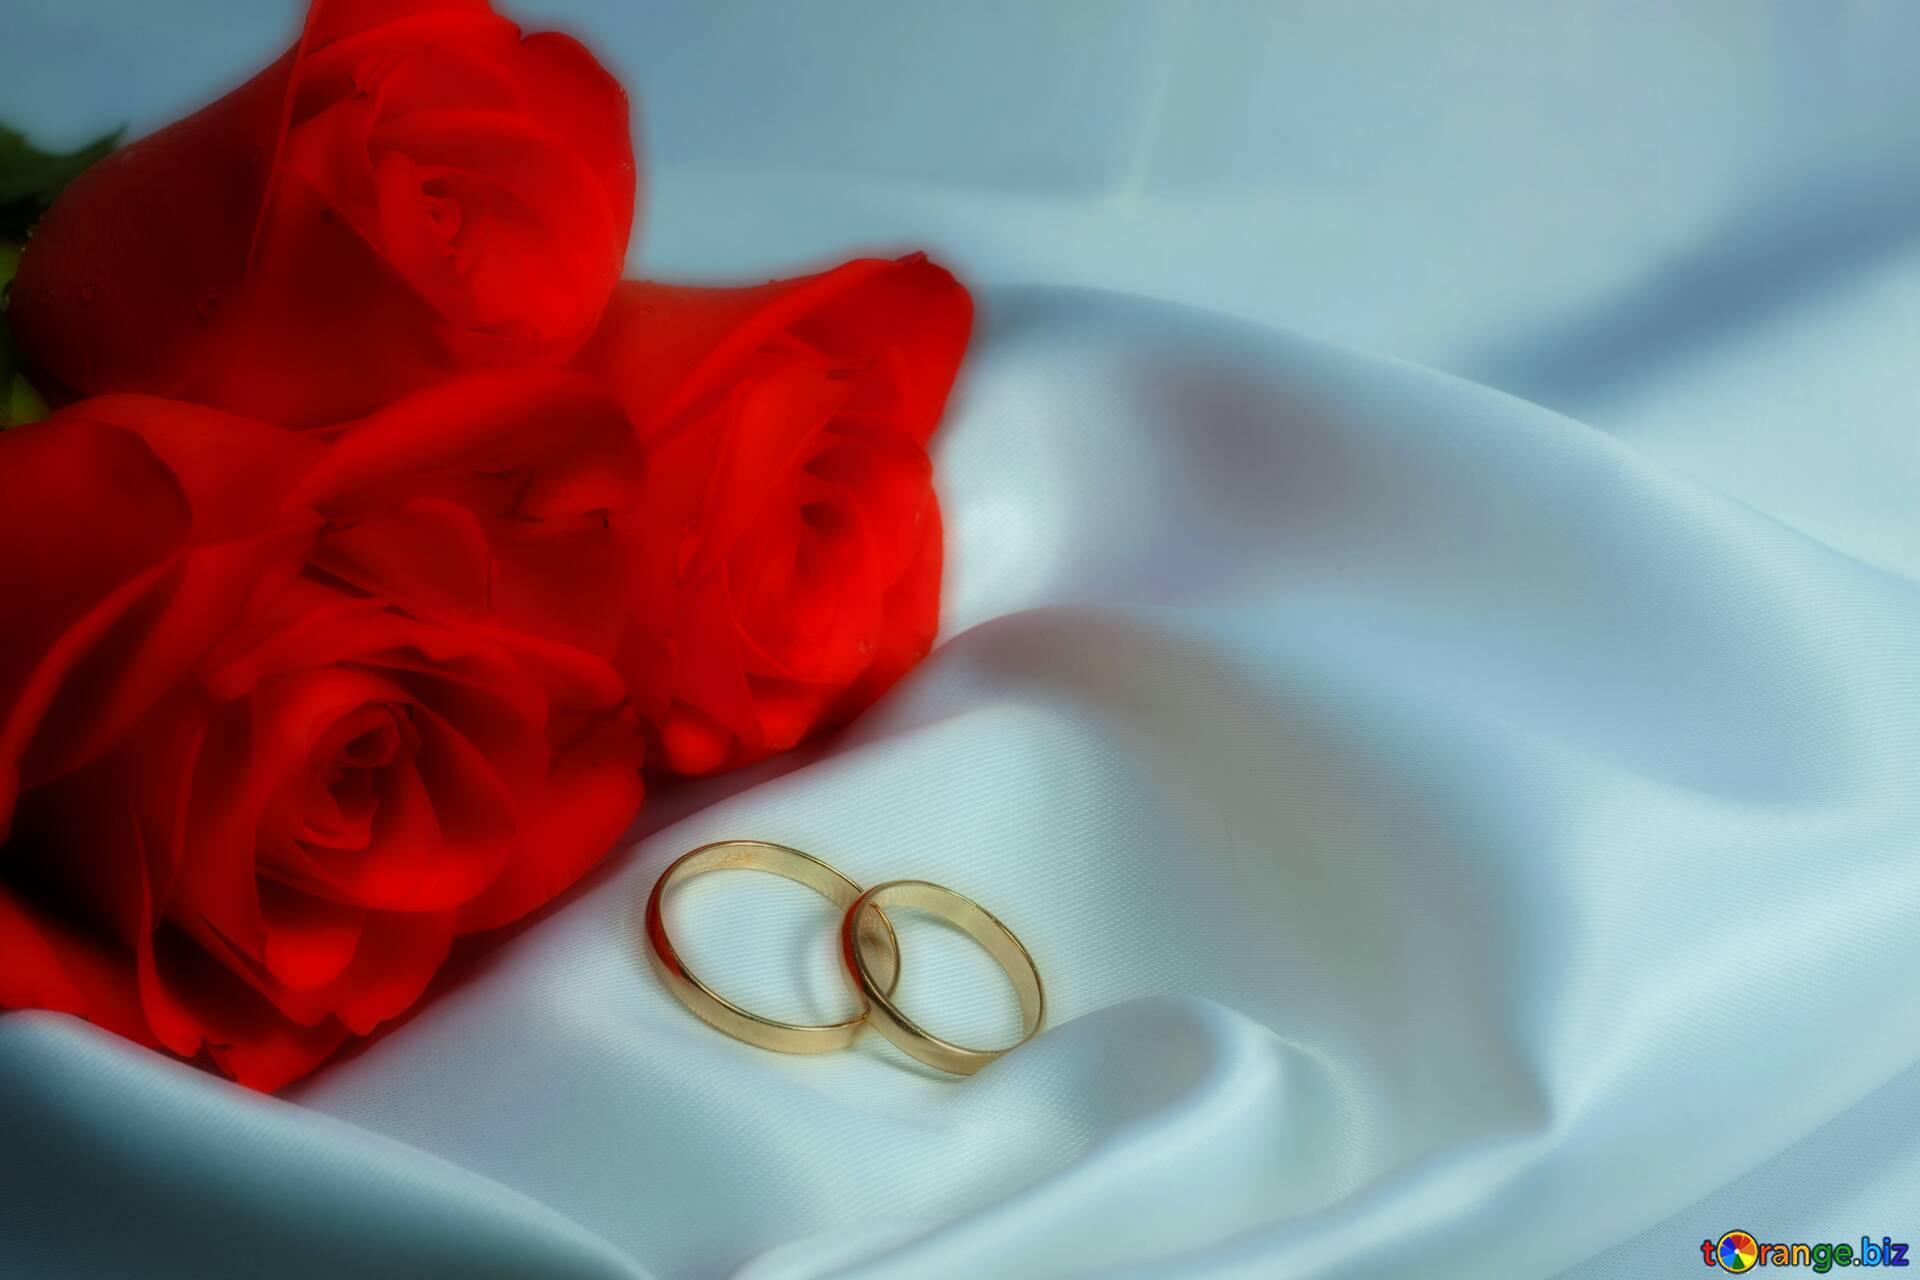 Download Free Picture Wedding Invitation Background On Cc By License Free Image Stock Torange Biz Fx 216125